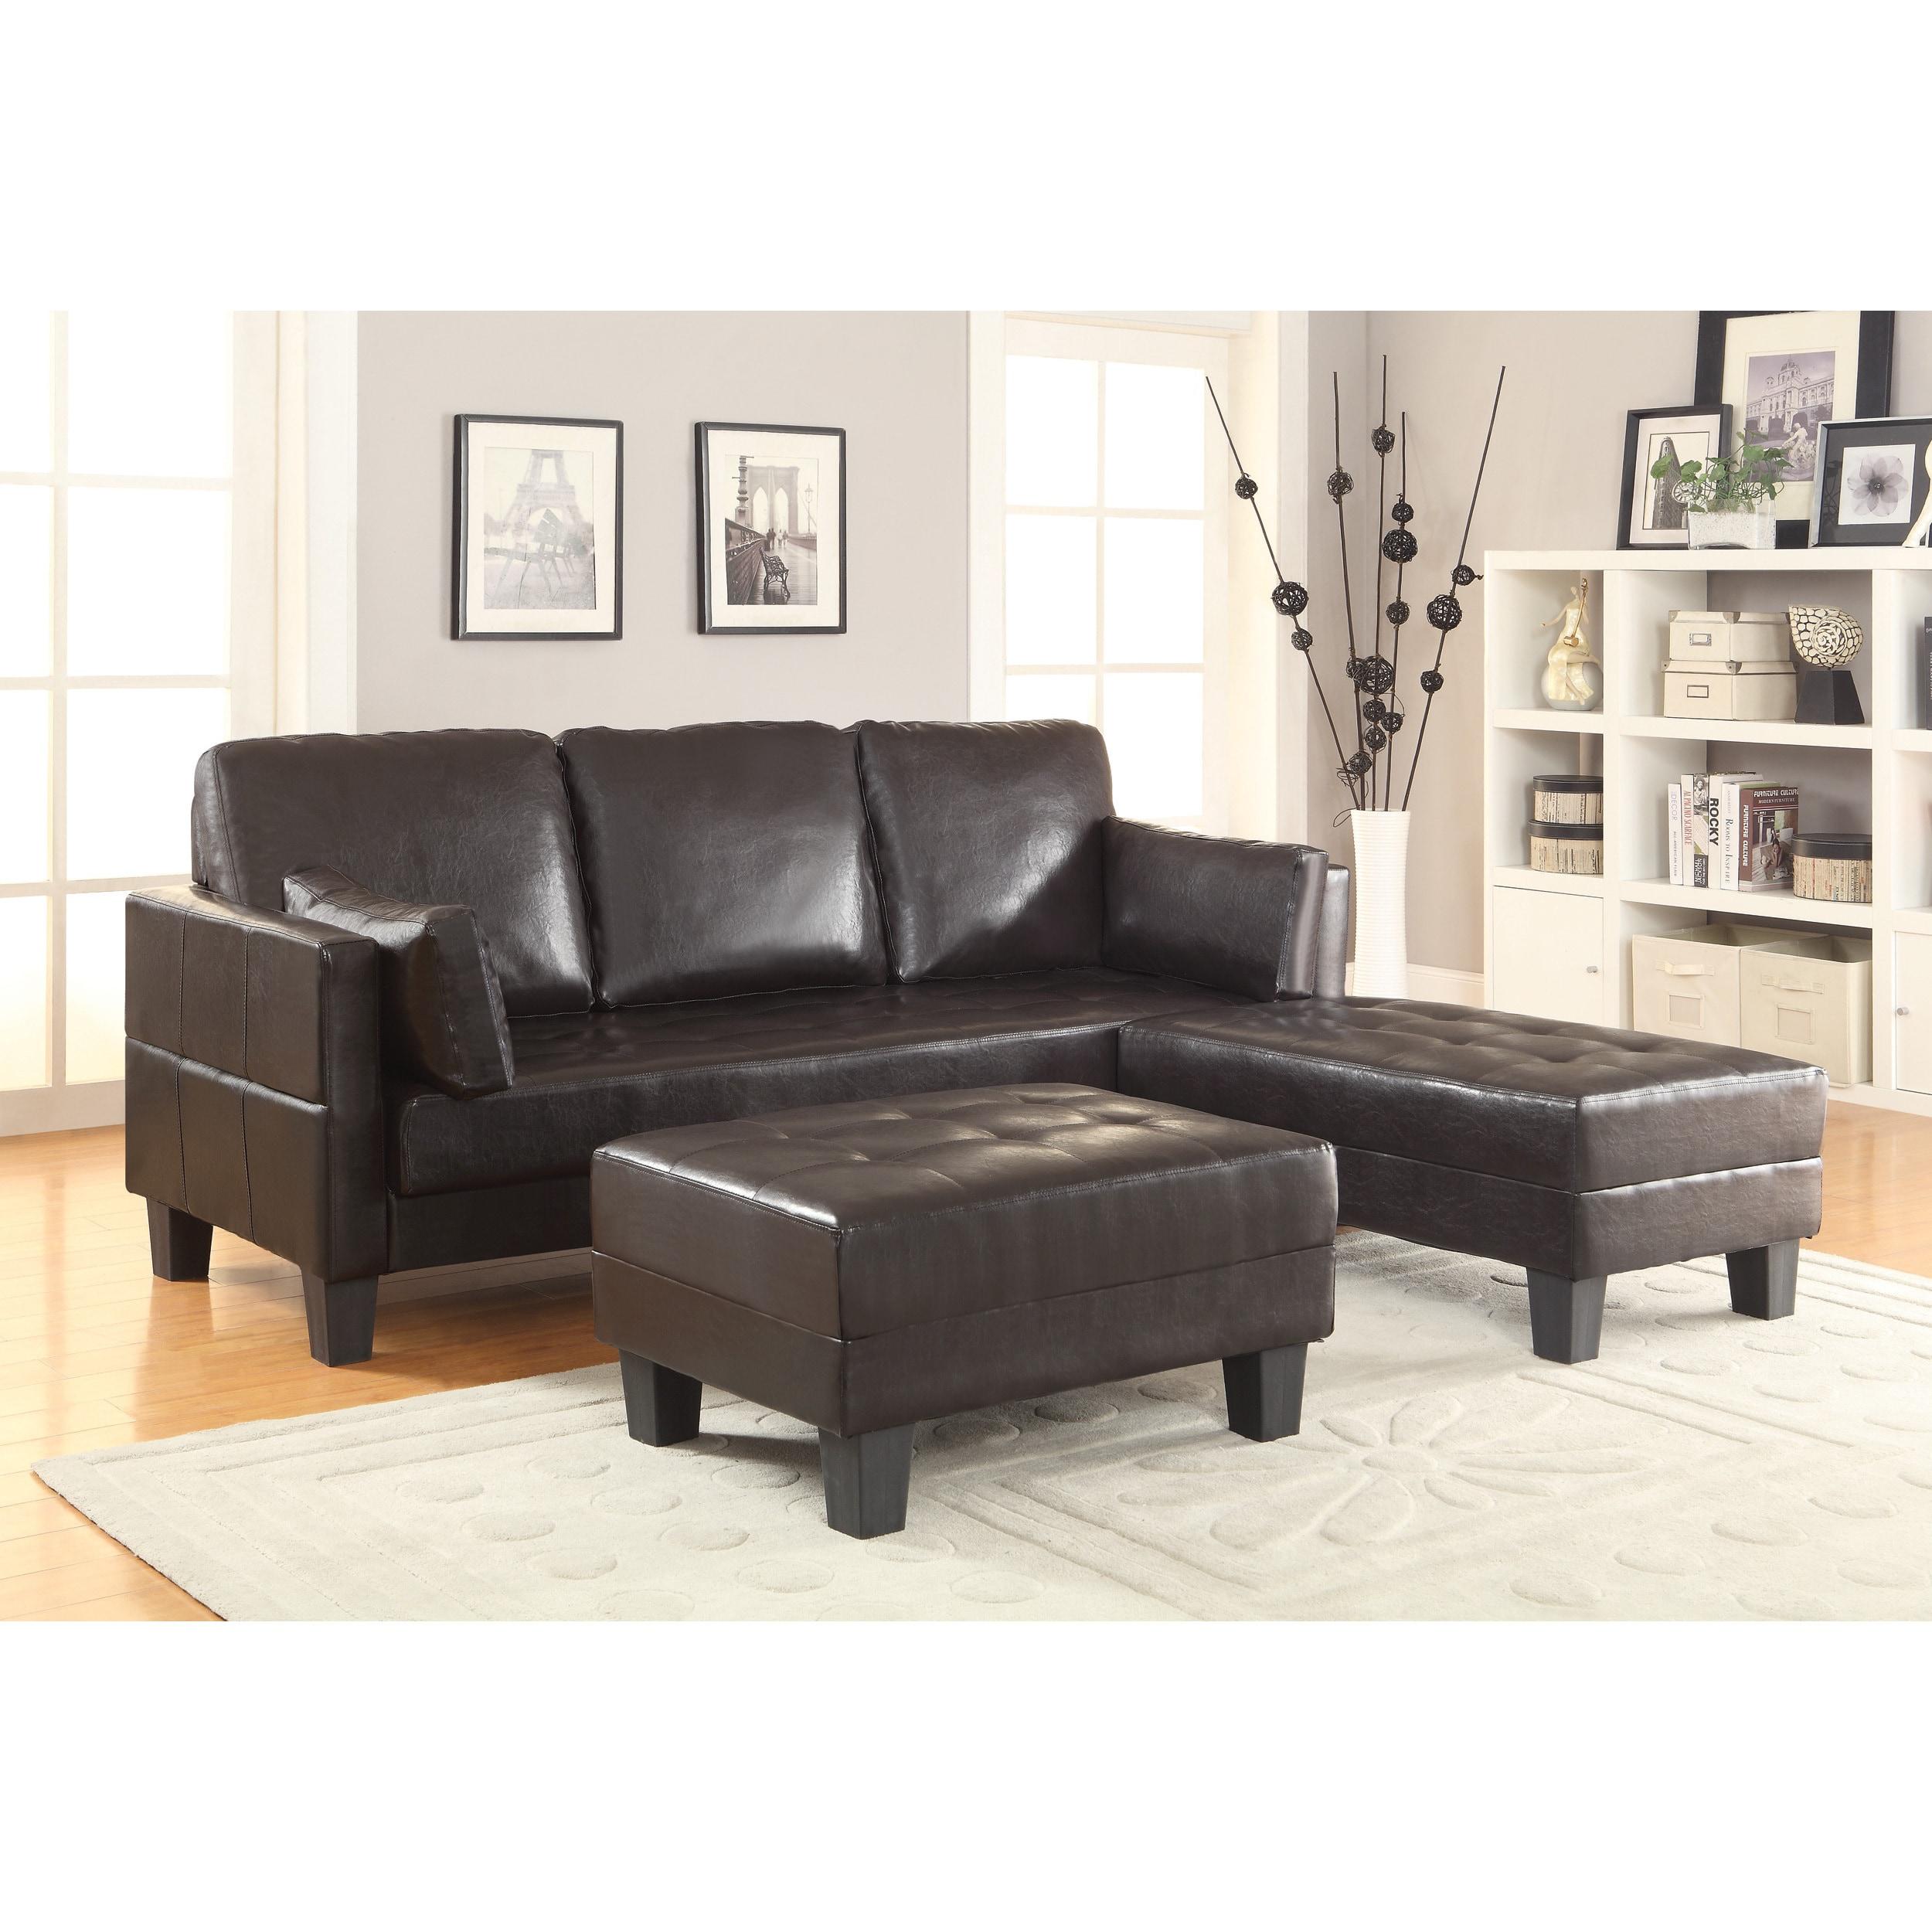 Coaster Furniture Brown Leatherette Sofa Bed (Brown) (Fau...